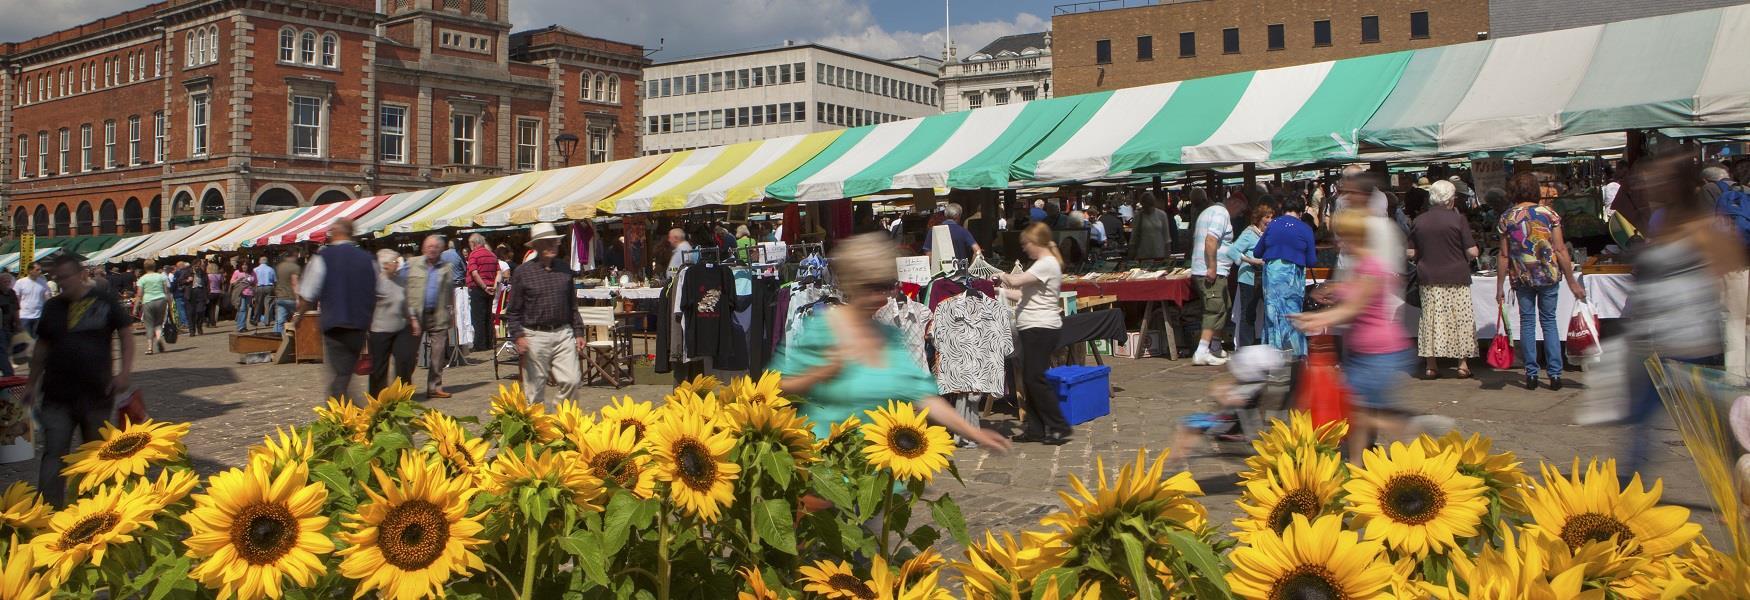 Chesterfield Market